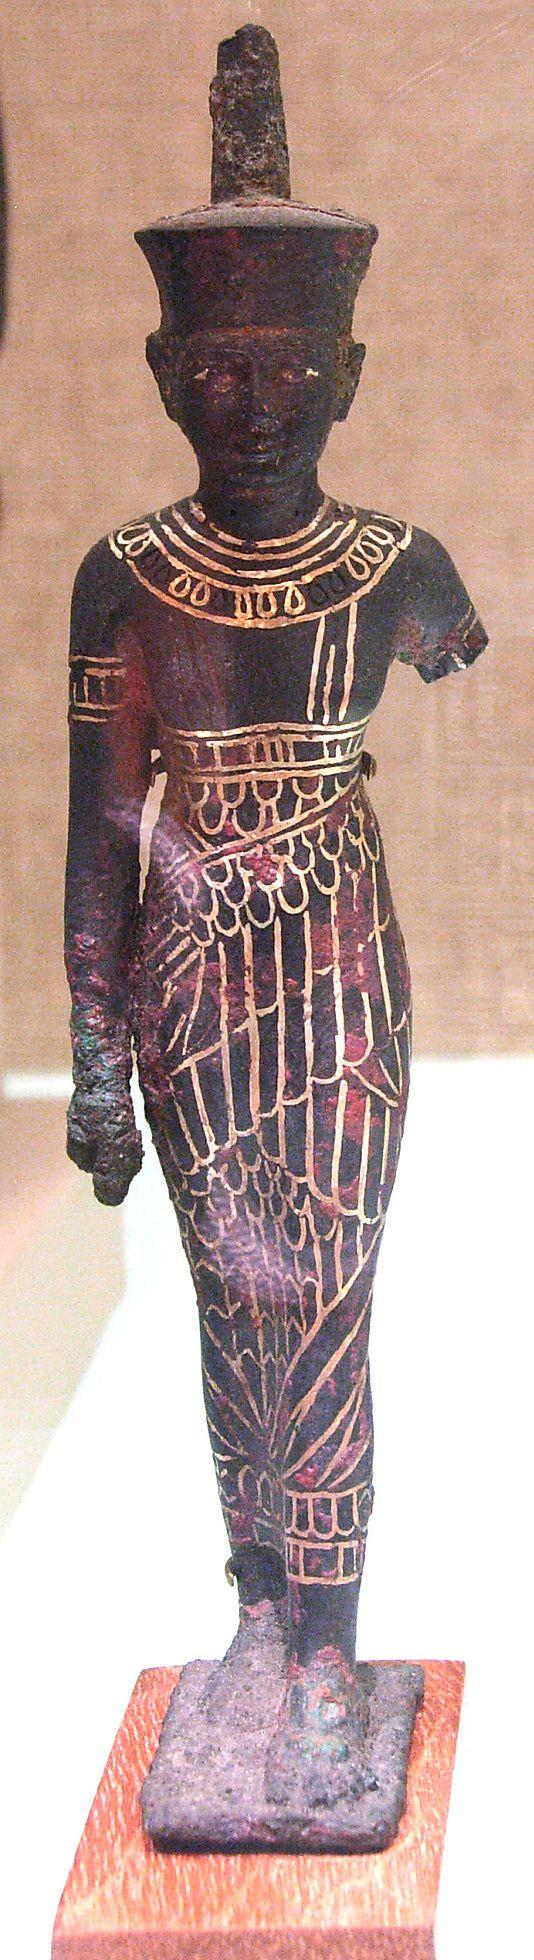 Statuette, Neith  Date: ca. 1070–664 B.C.  Accession Number: 44.4.85